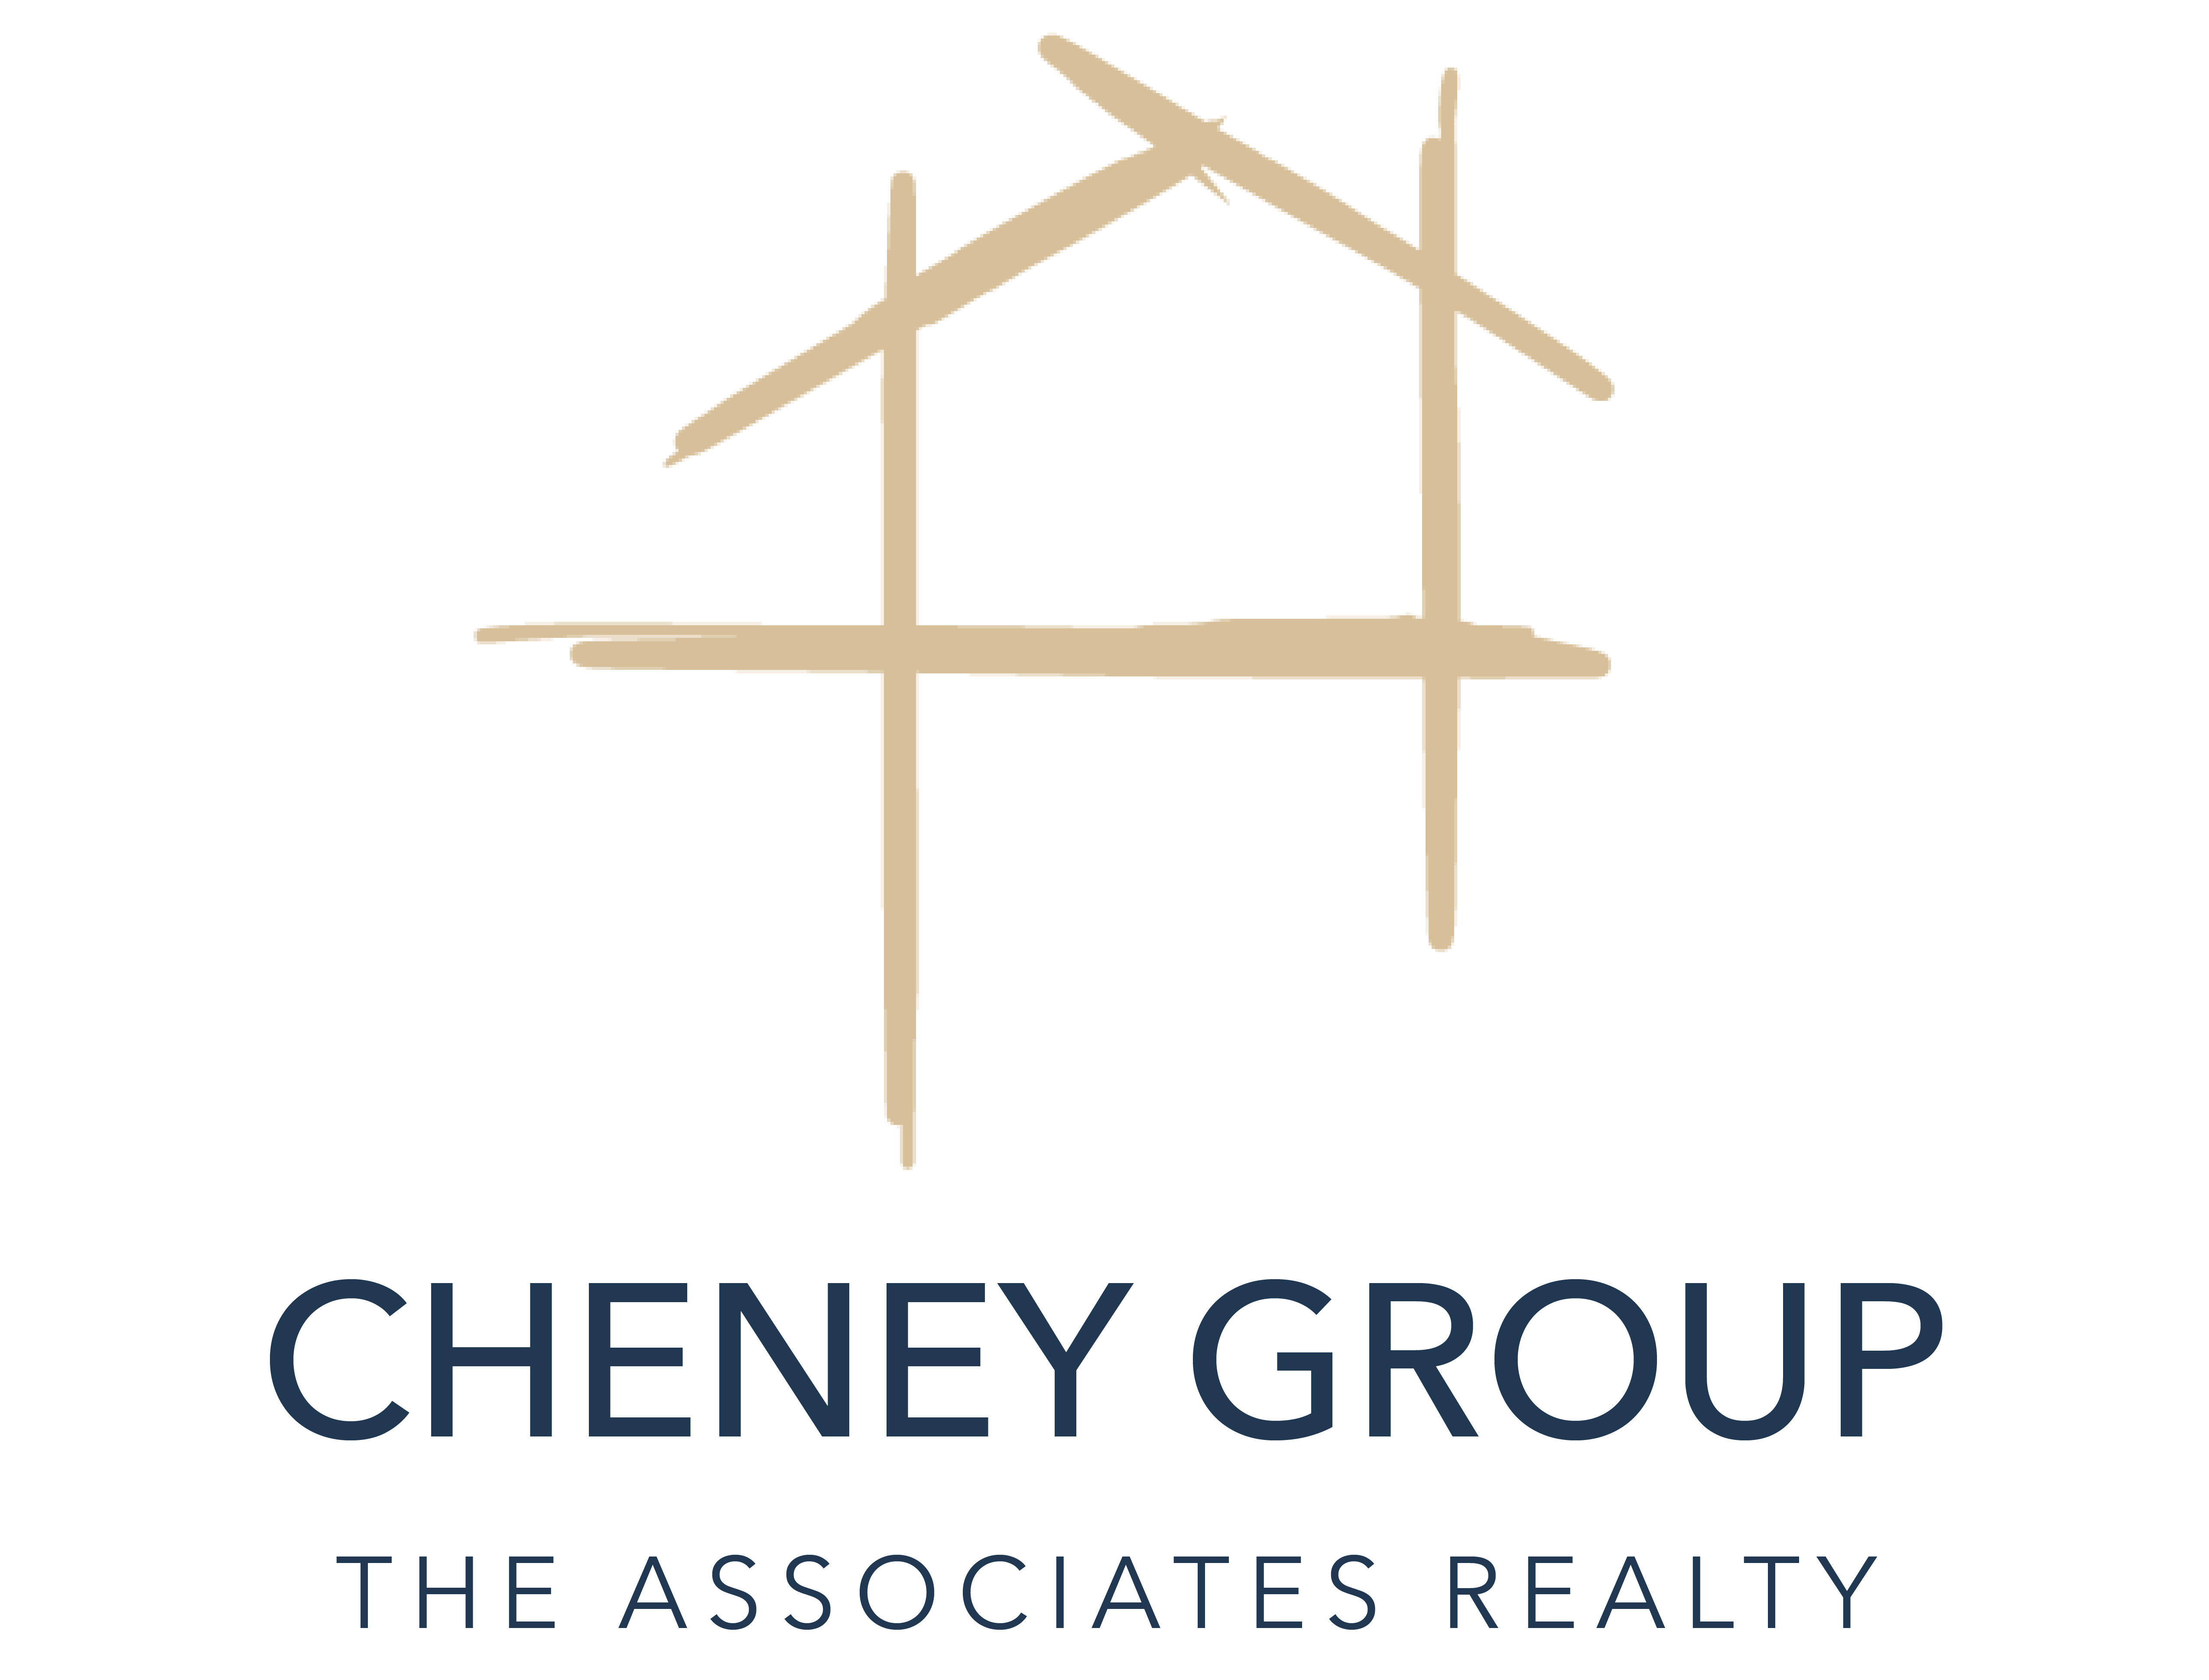 Cheney group sponsor logo